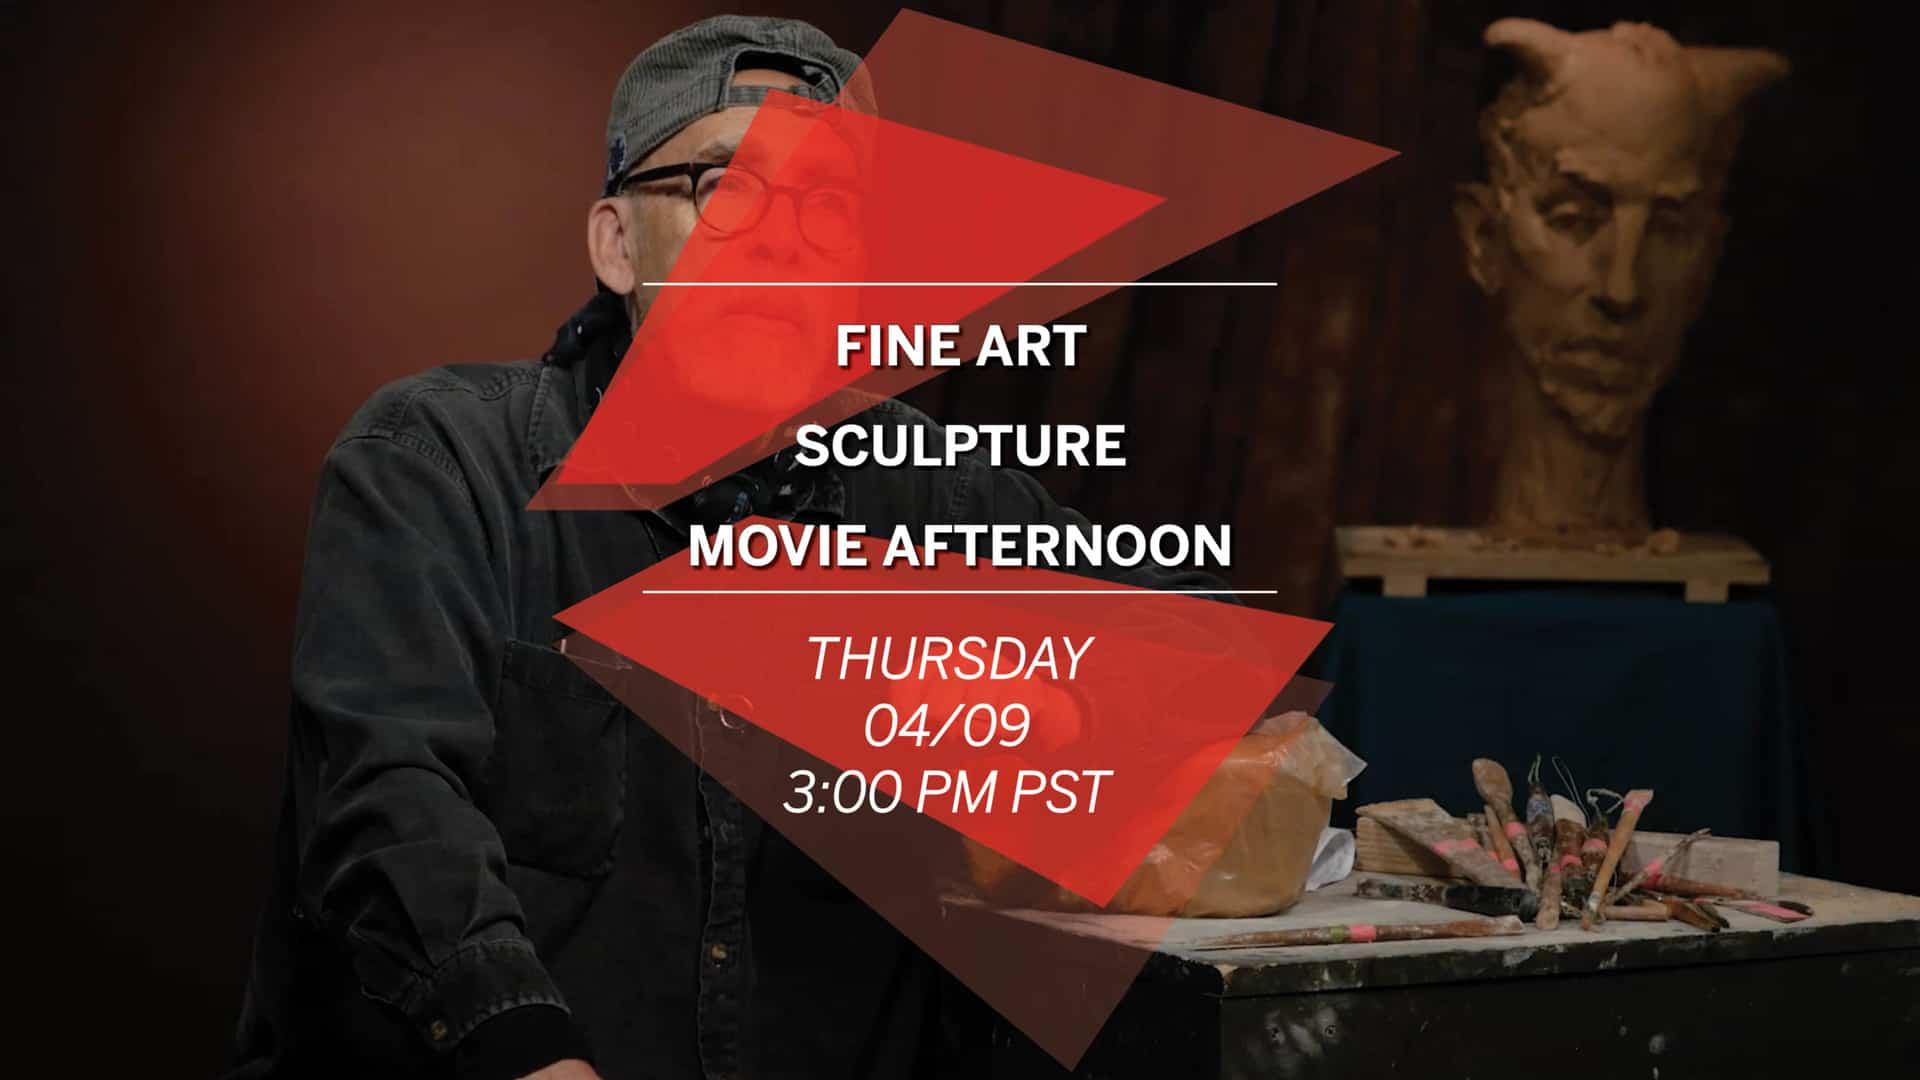 School of Fine Art Sculpture: Movie Afternoon Ep. 2